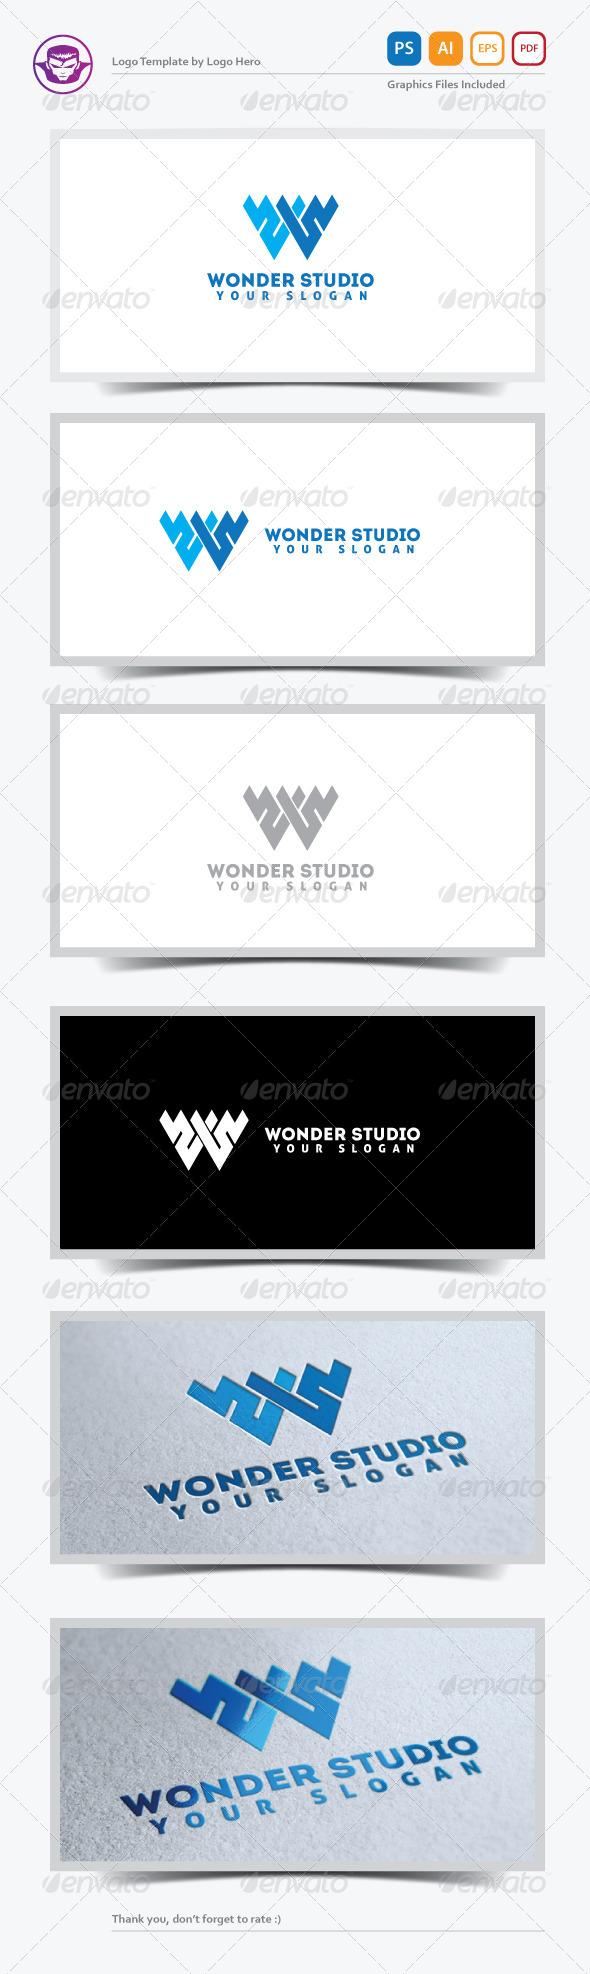 GraphicRiver Wonder Studio Logo Template 5245414